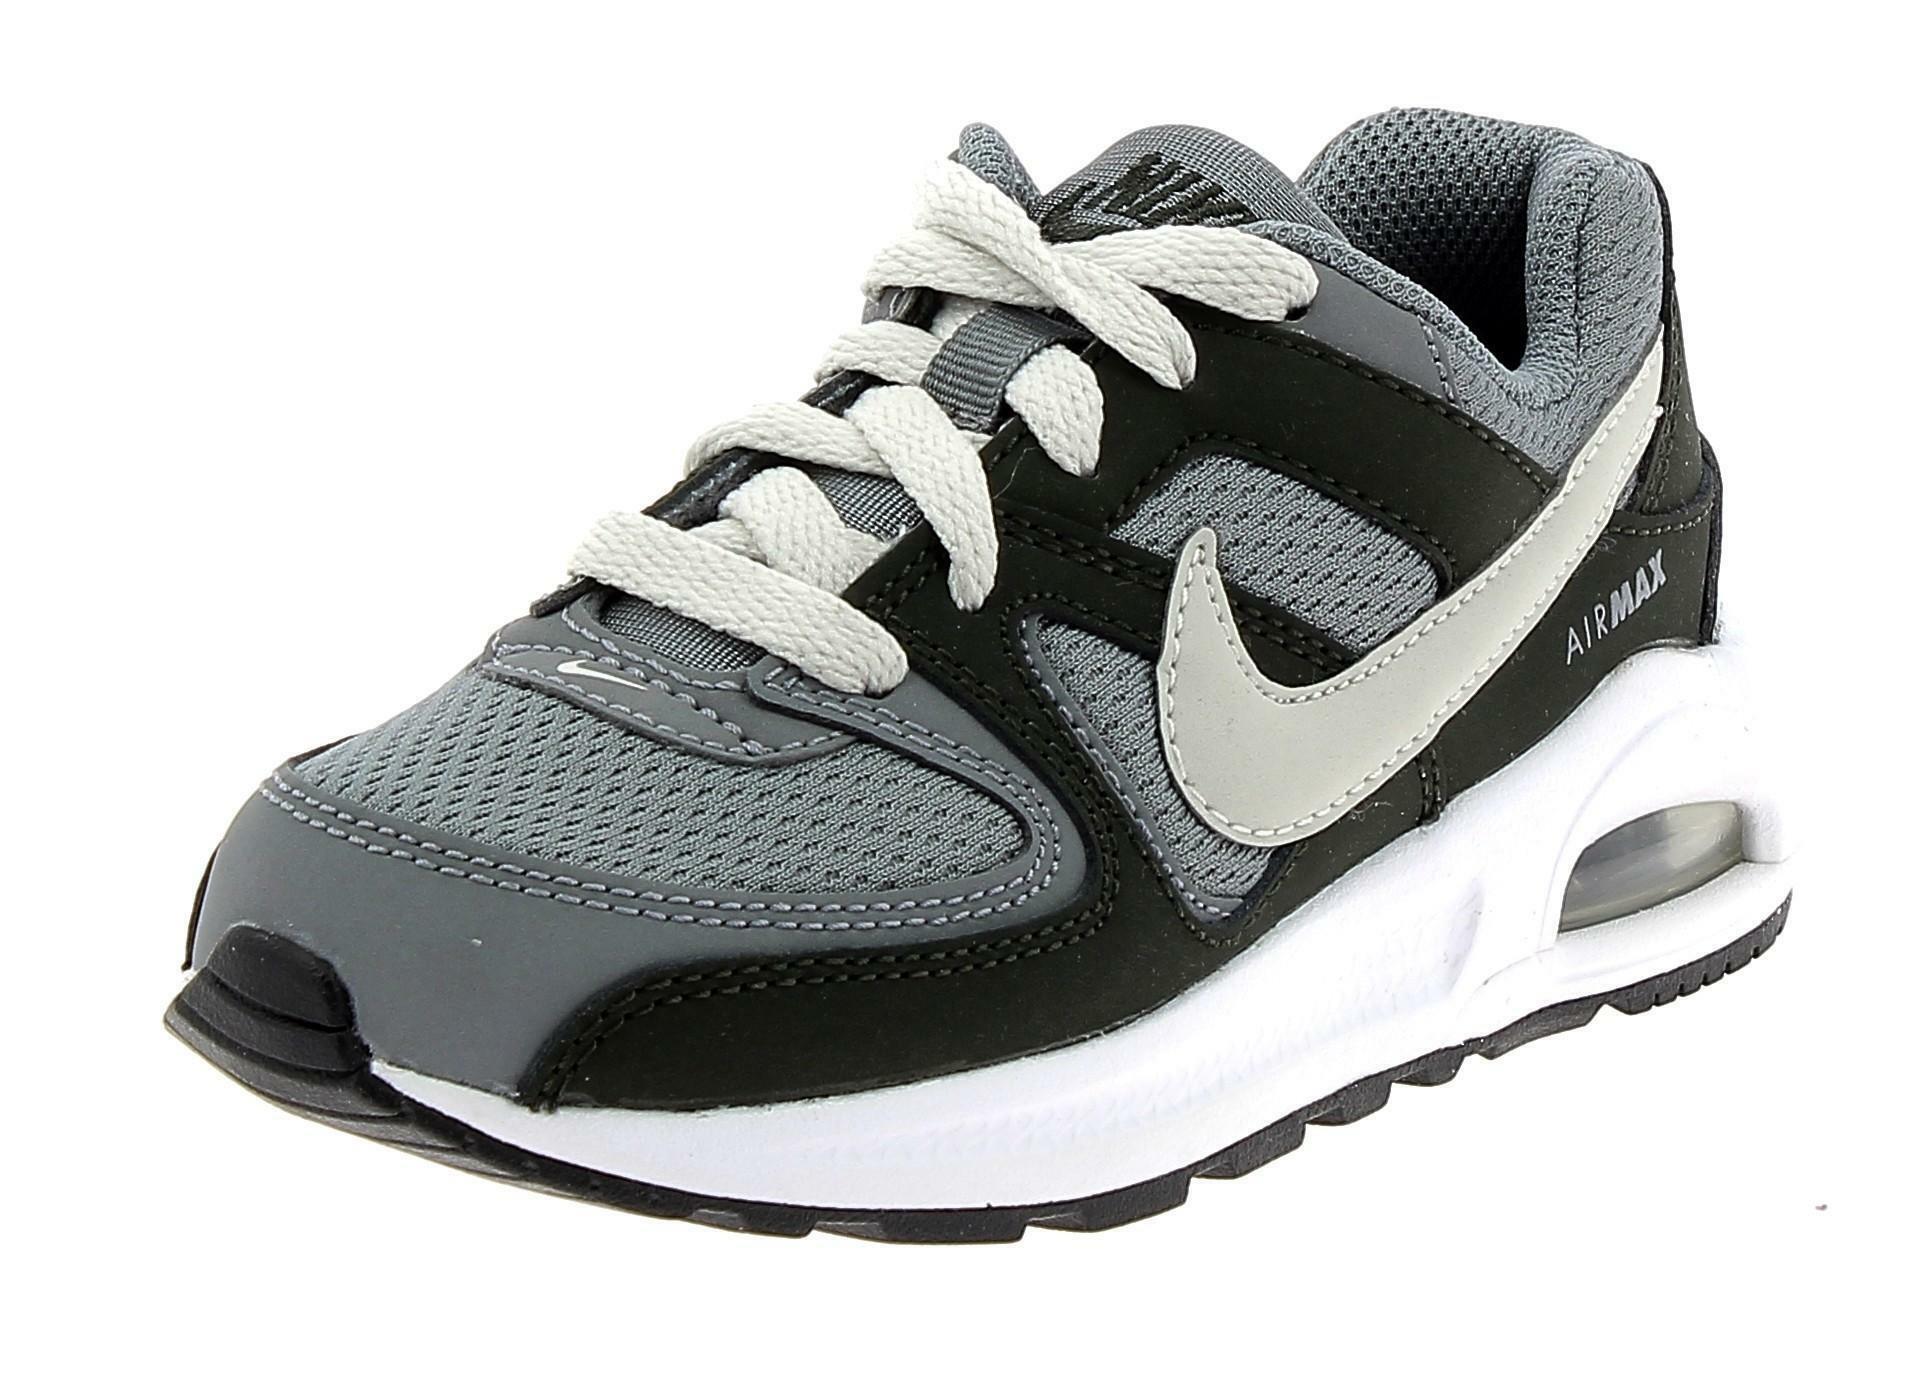 buy popular 51ca8 10fd5 Nike Air Max Command Flex Ps Scarpe Sportive Bambino Grigie 844347006